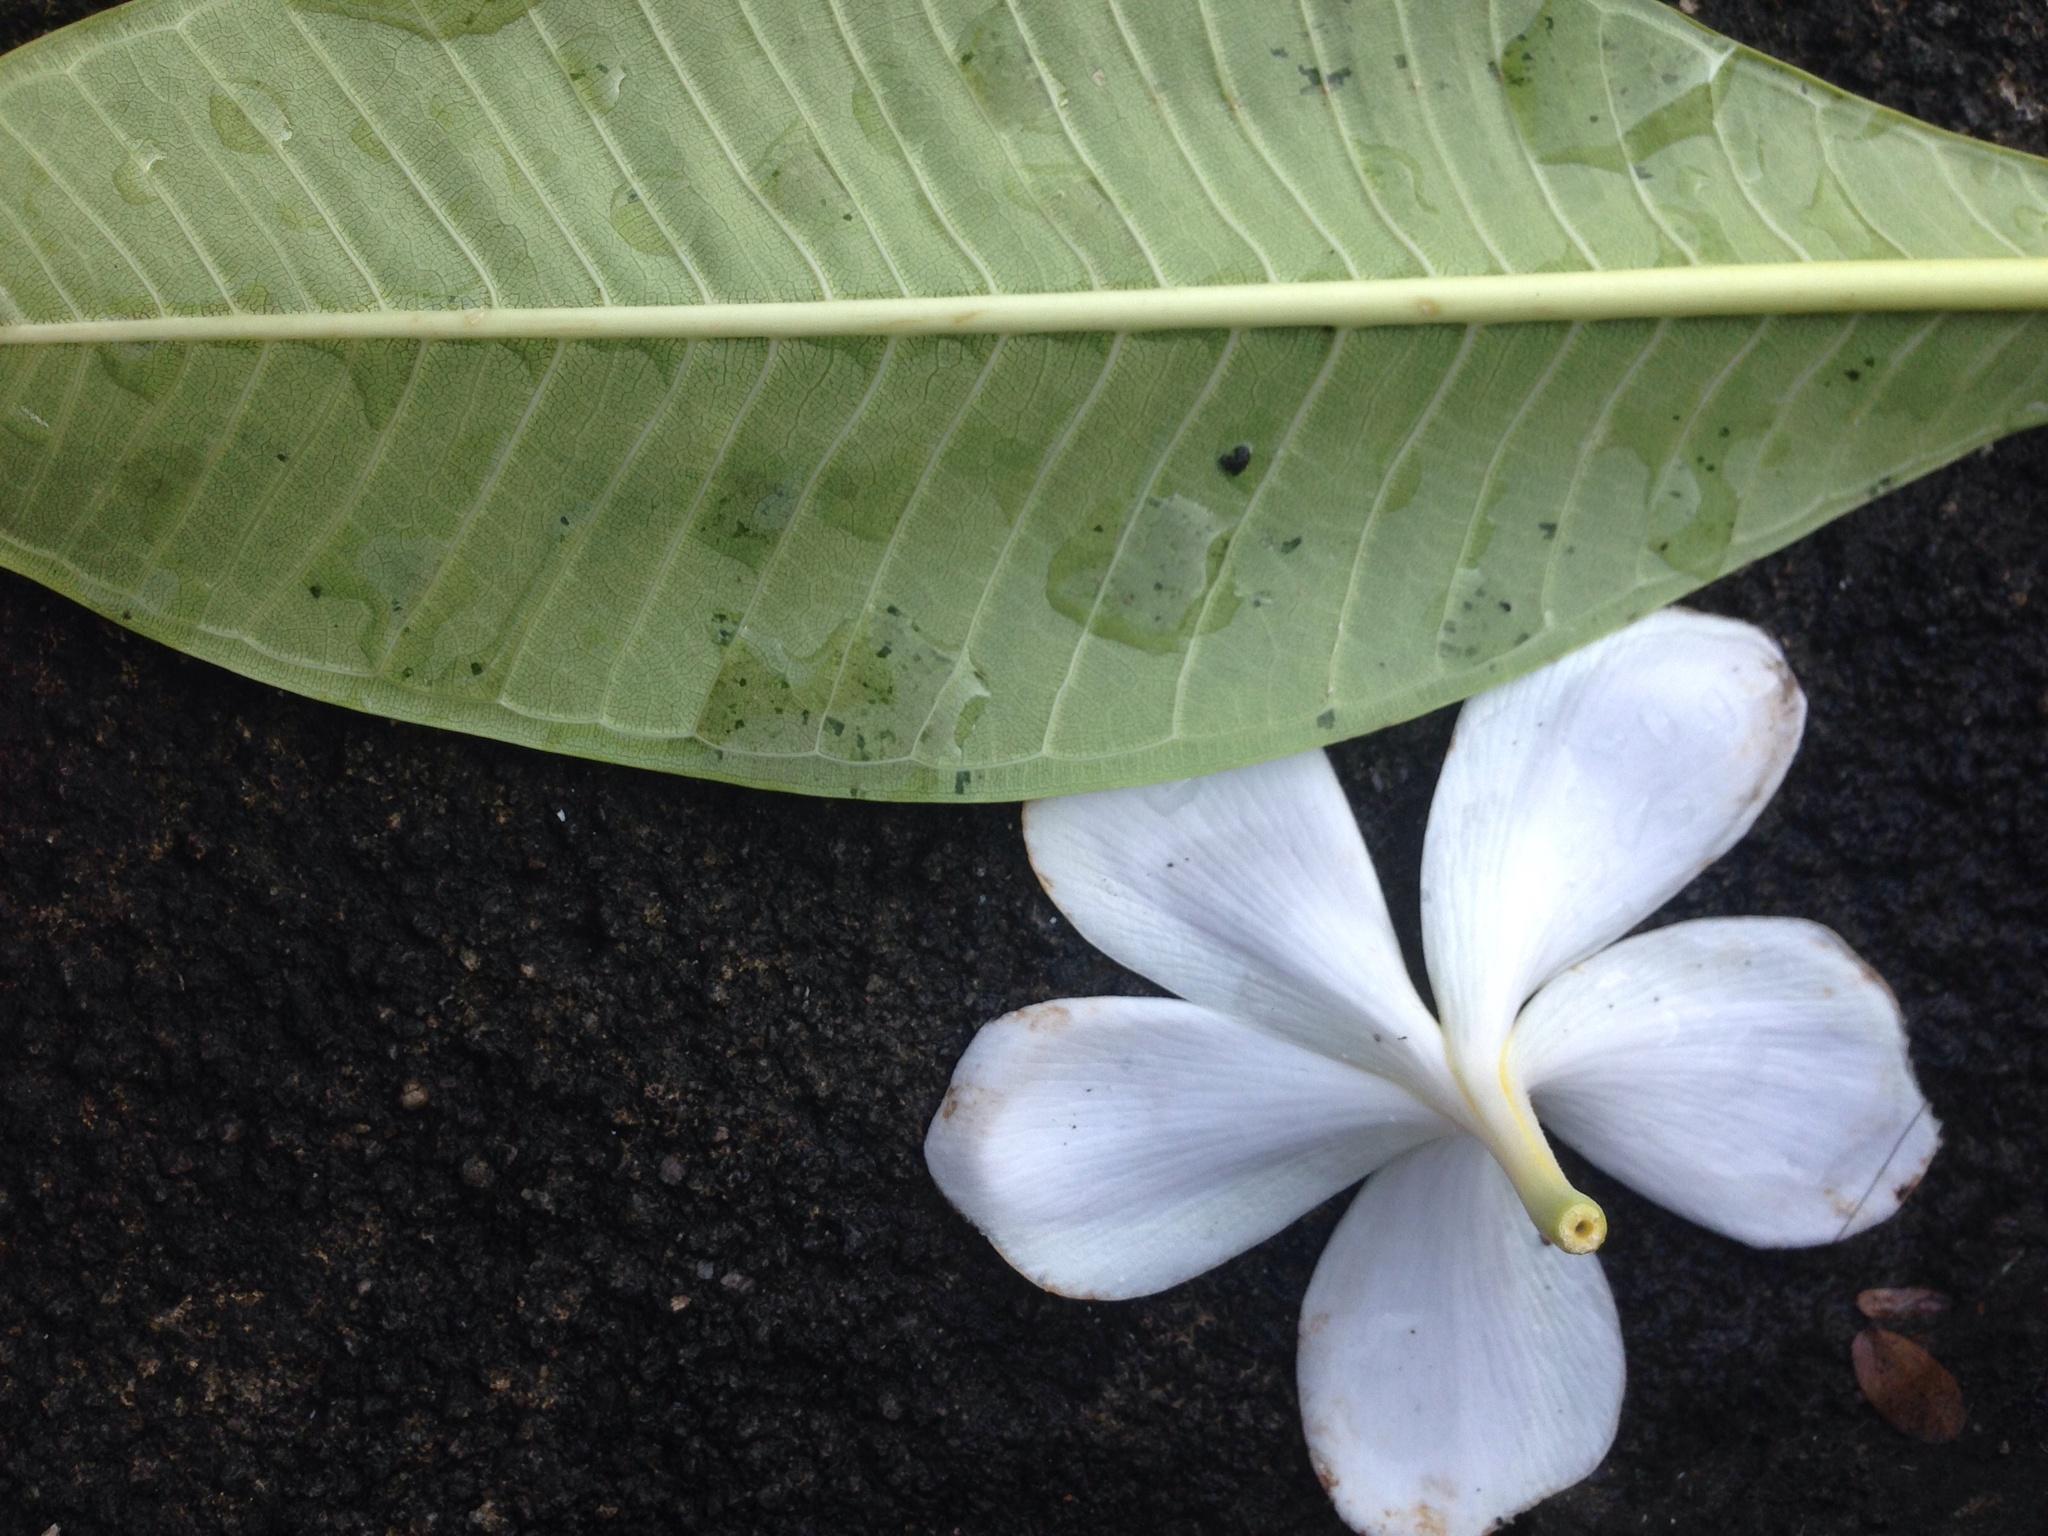 Flower and Leaf by jimbo.velasquez.1